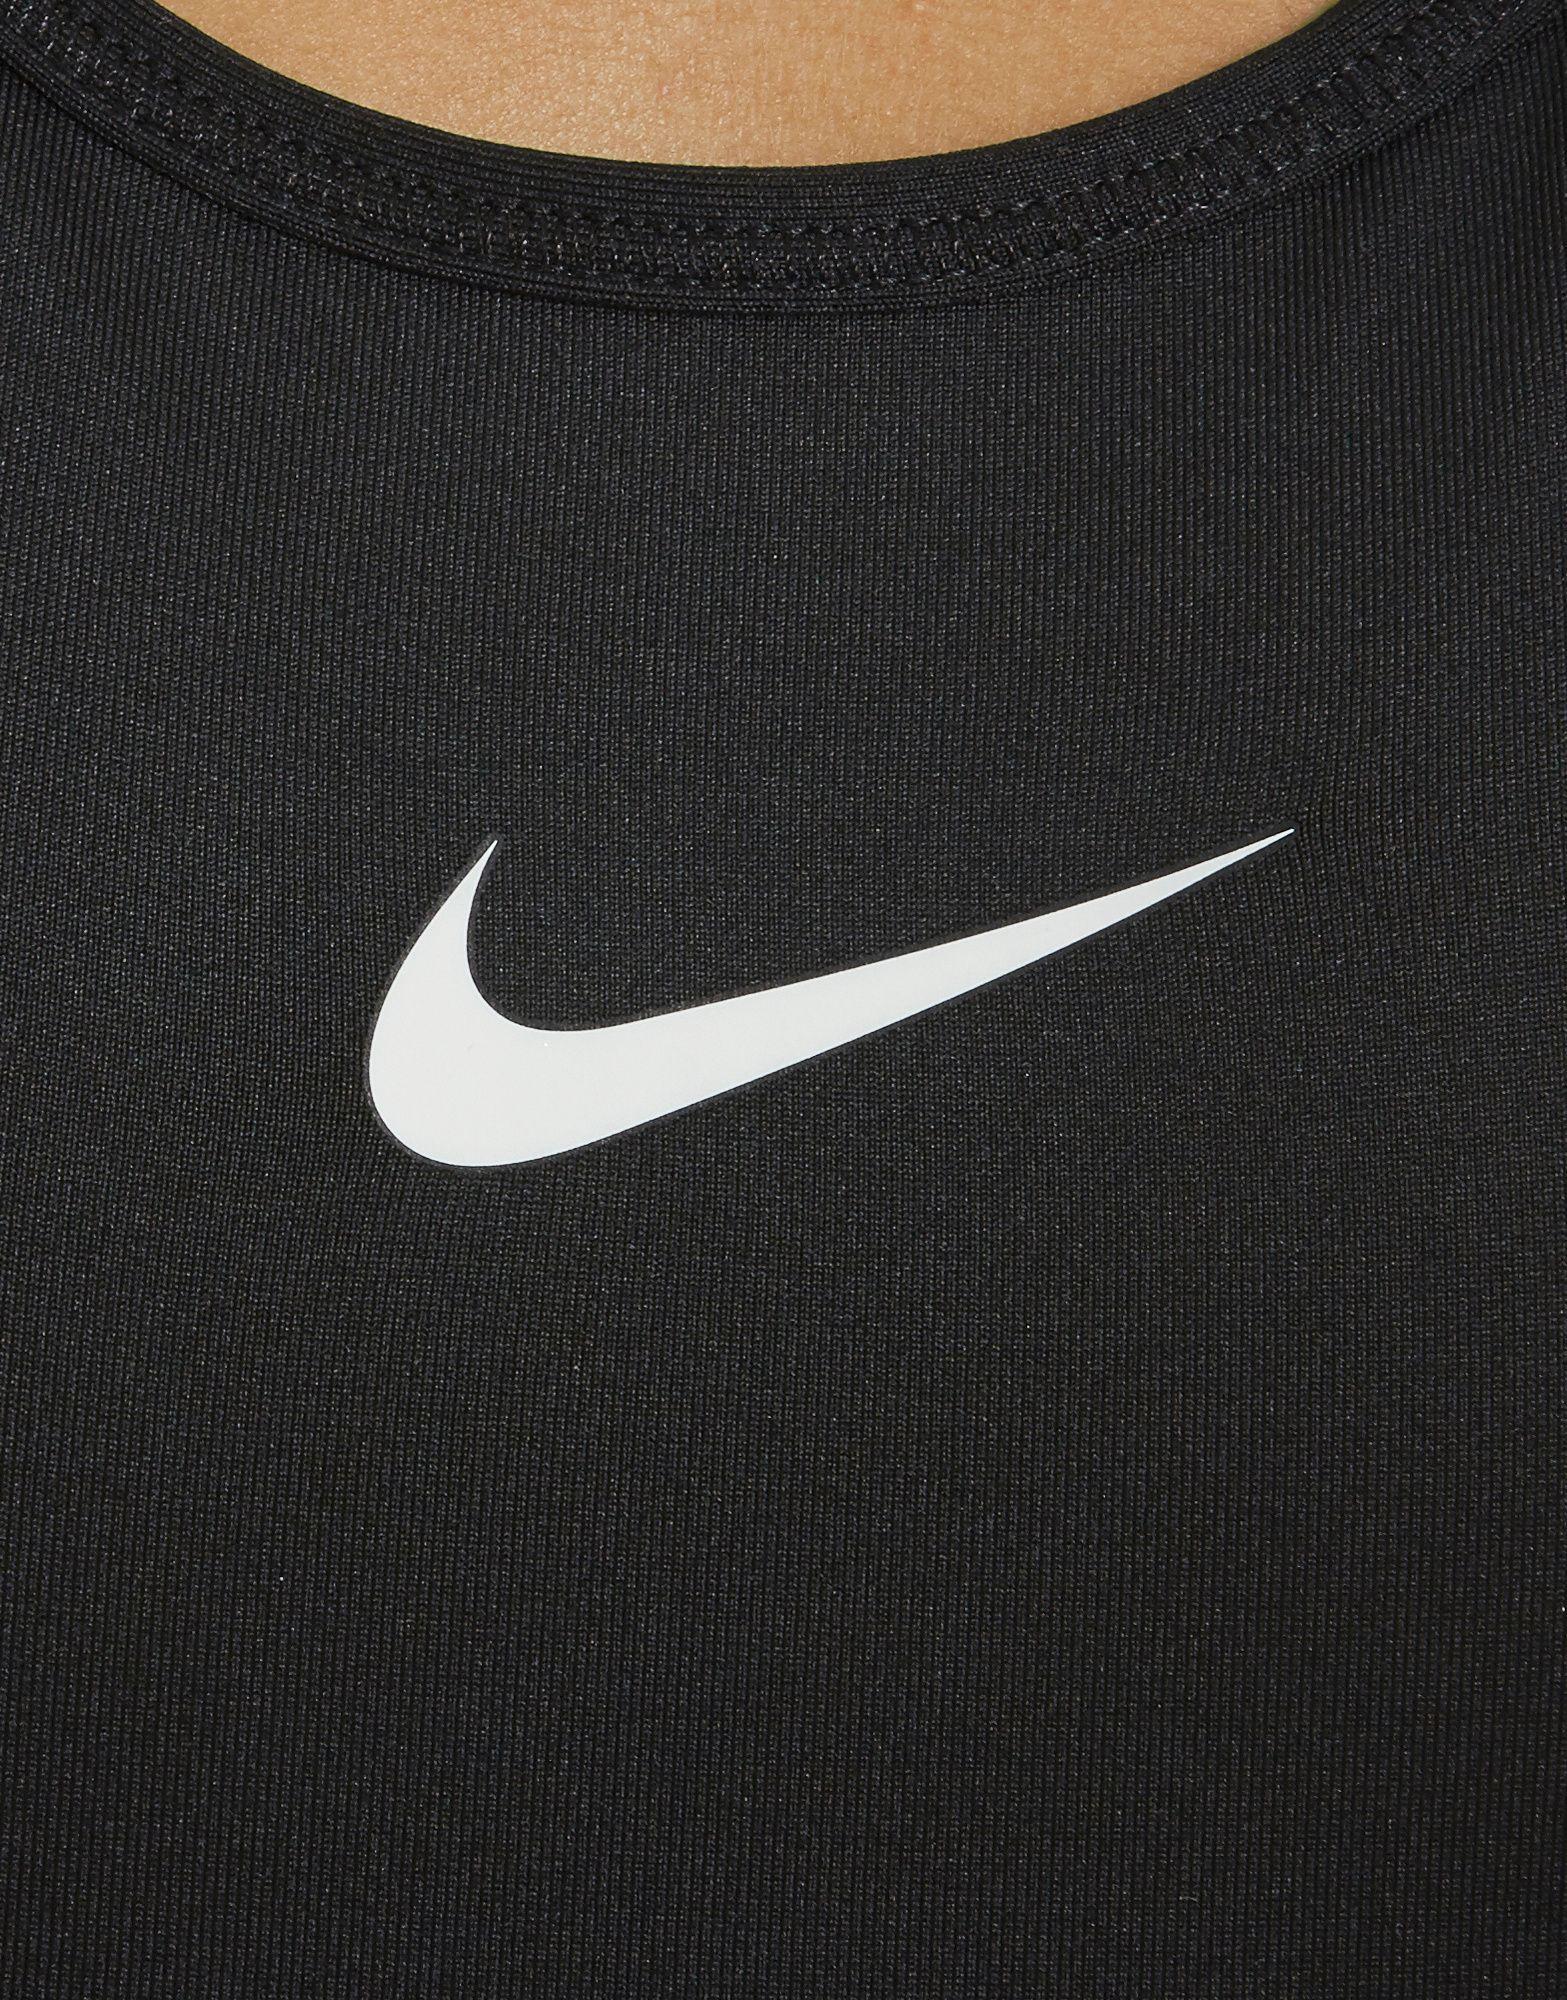 Nike Pro Airbourne Sports Bra